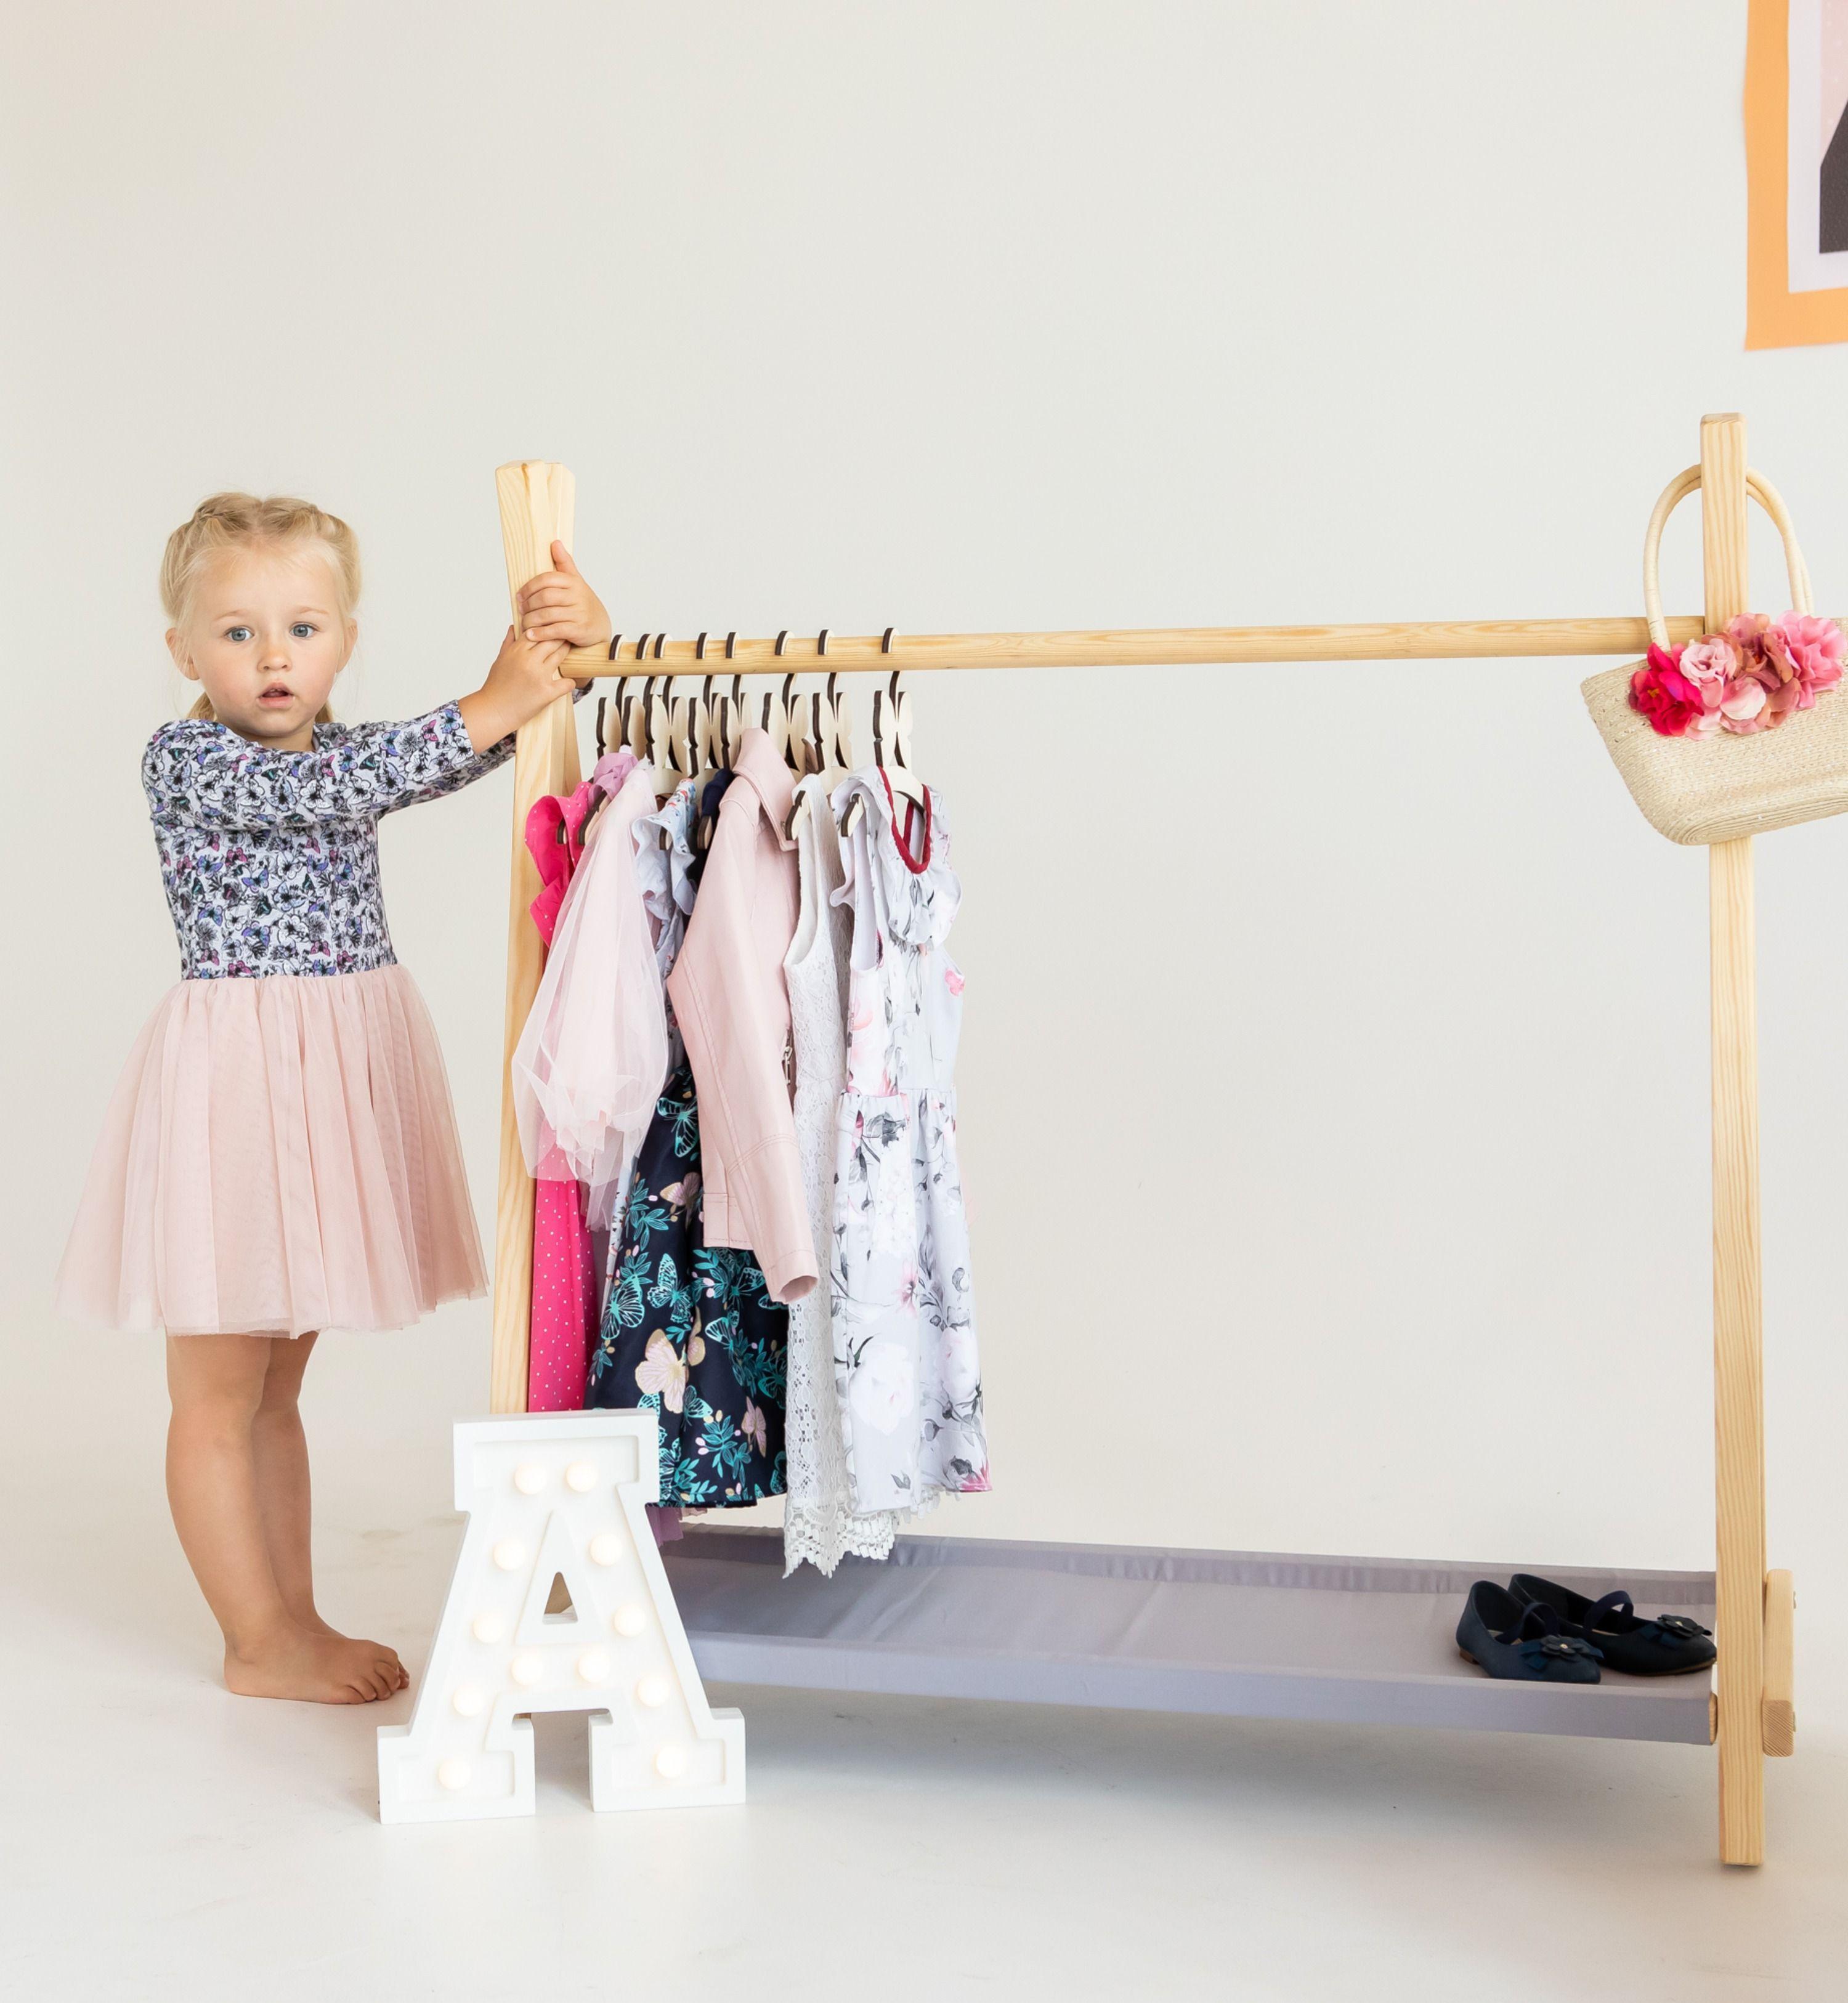 Kids Clothing Rack Wooden